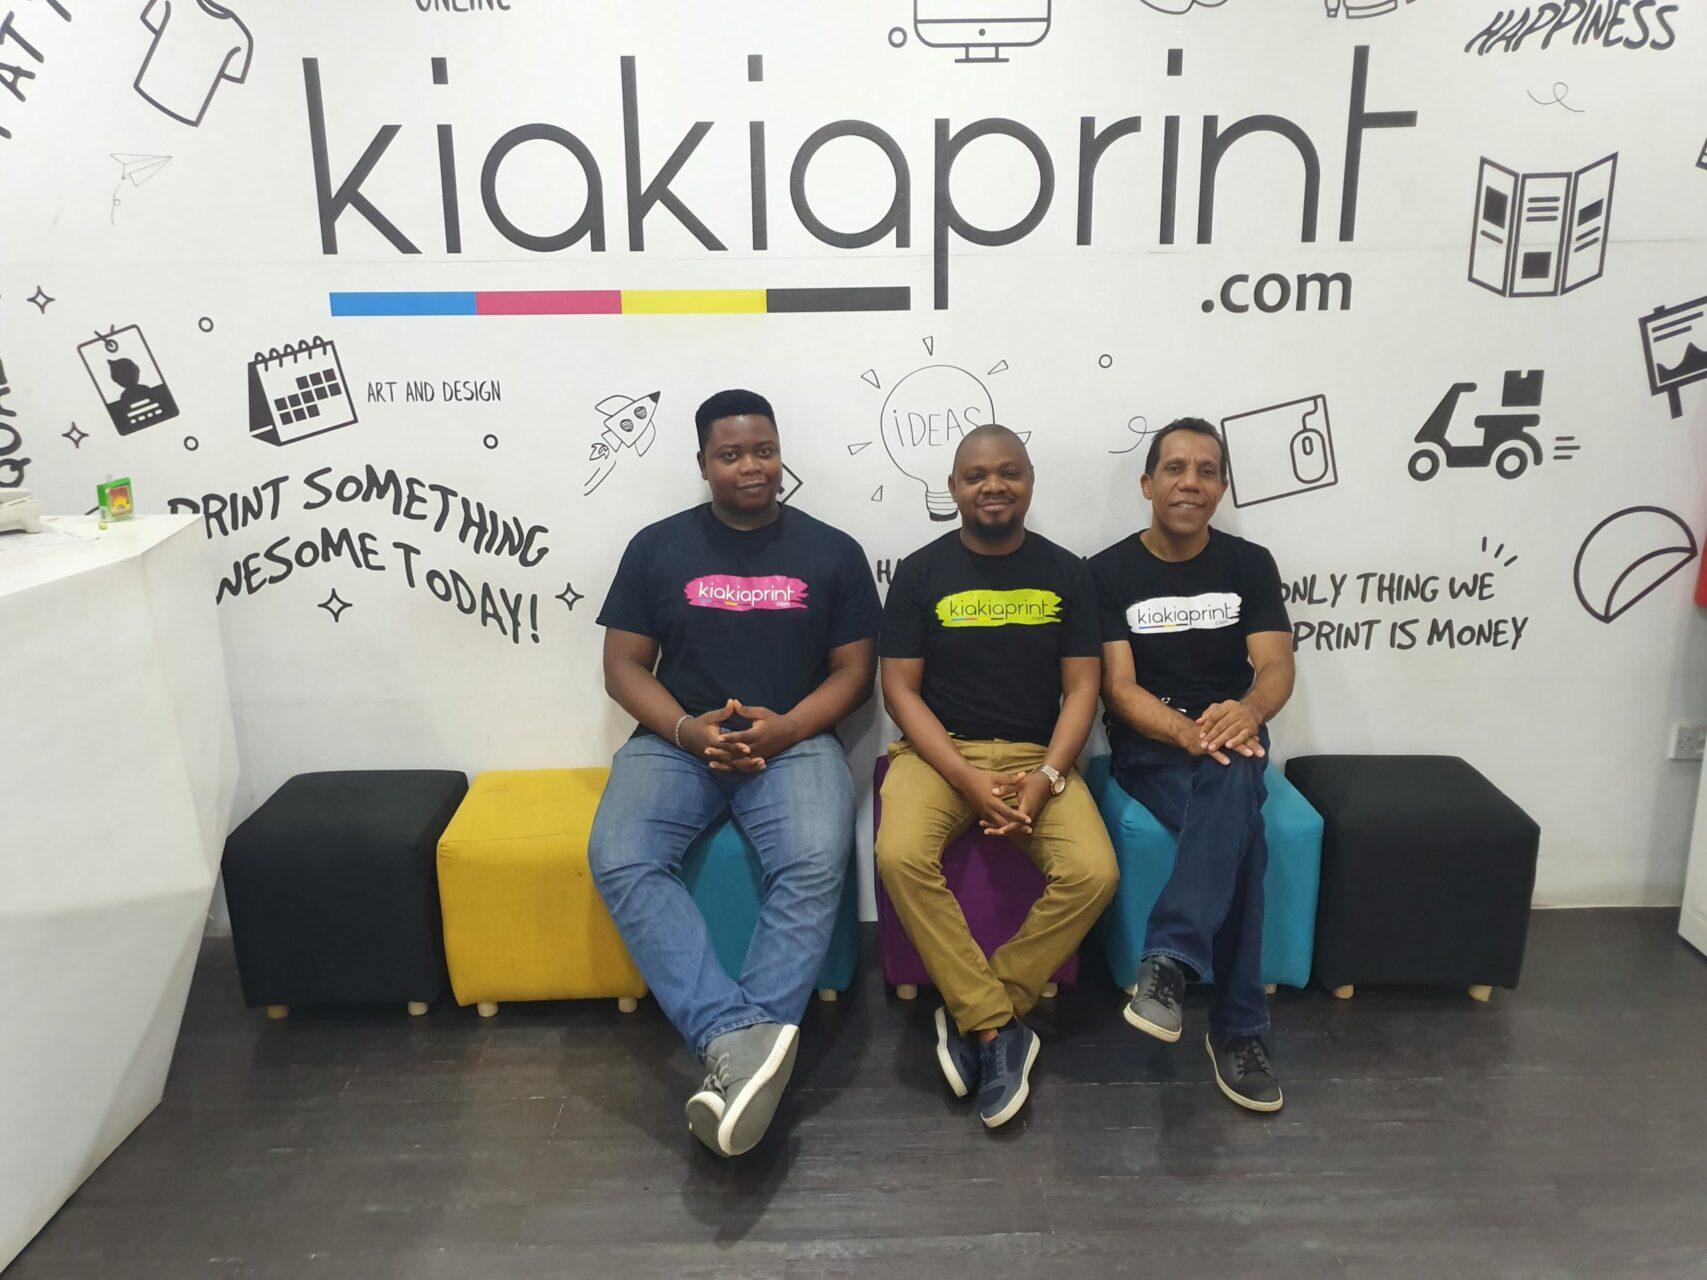 co founders Kiakiaprint scaled